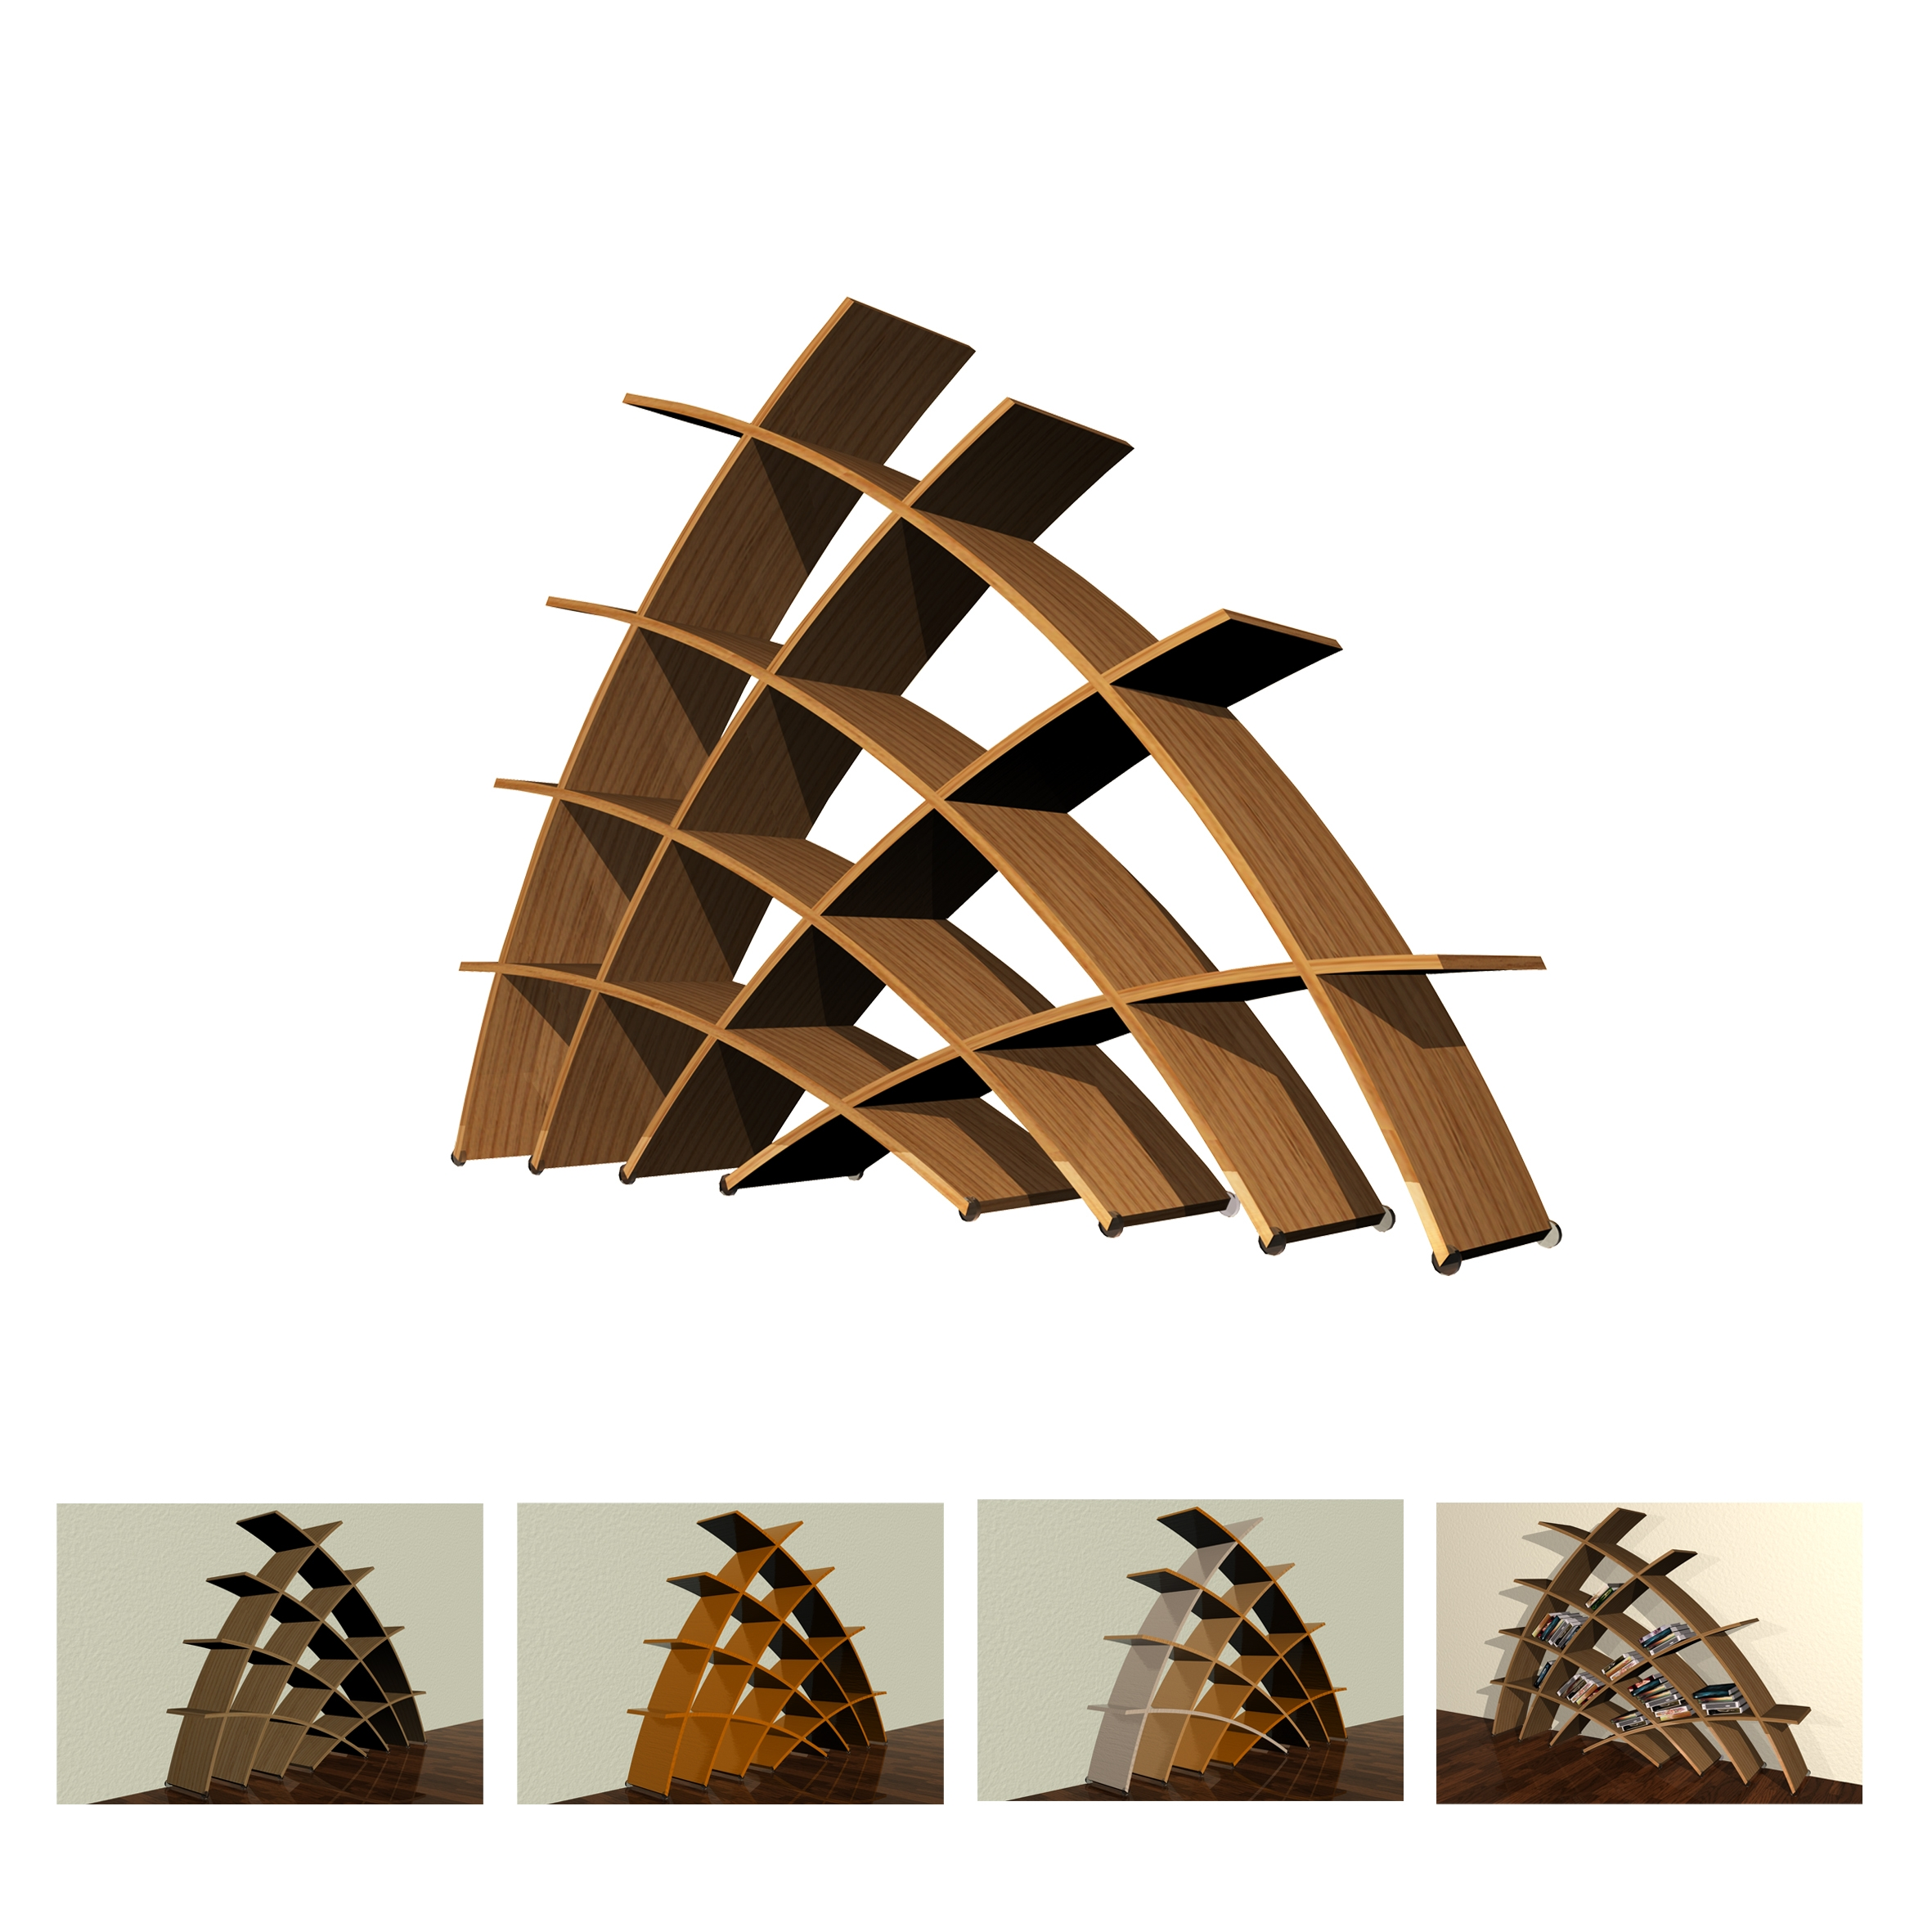 Furniture Design Camilla Fucili At Coroflot In Free Standing Book Shelf (View 9 of 15)